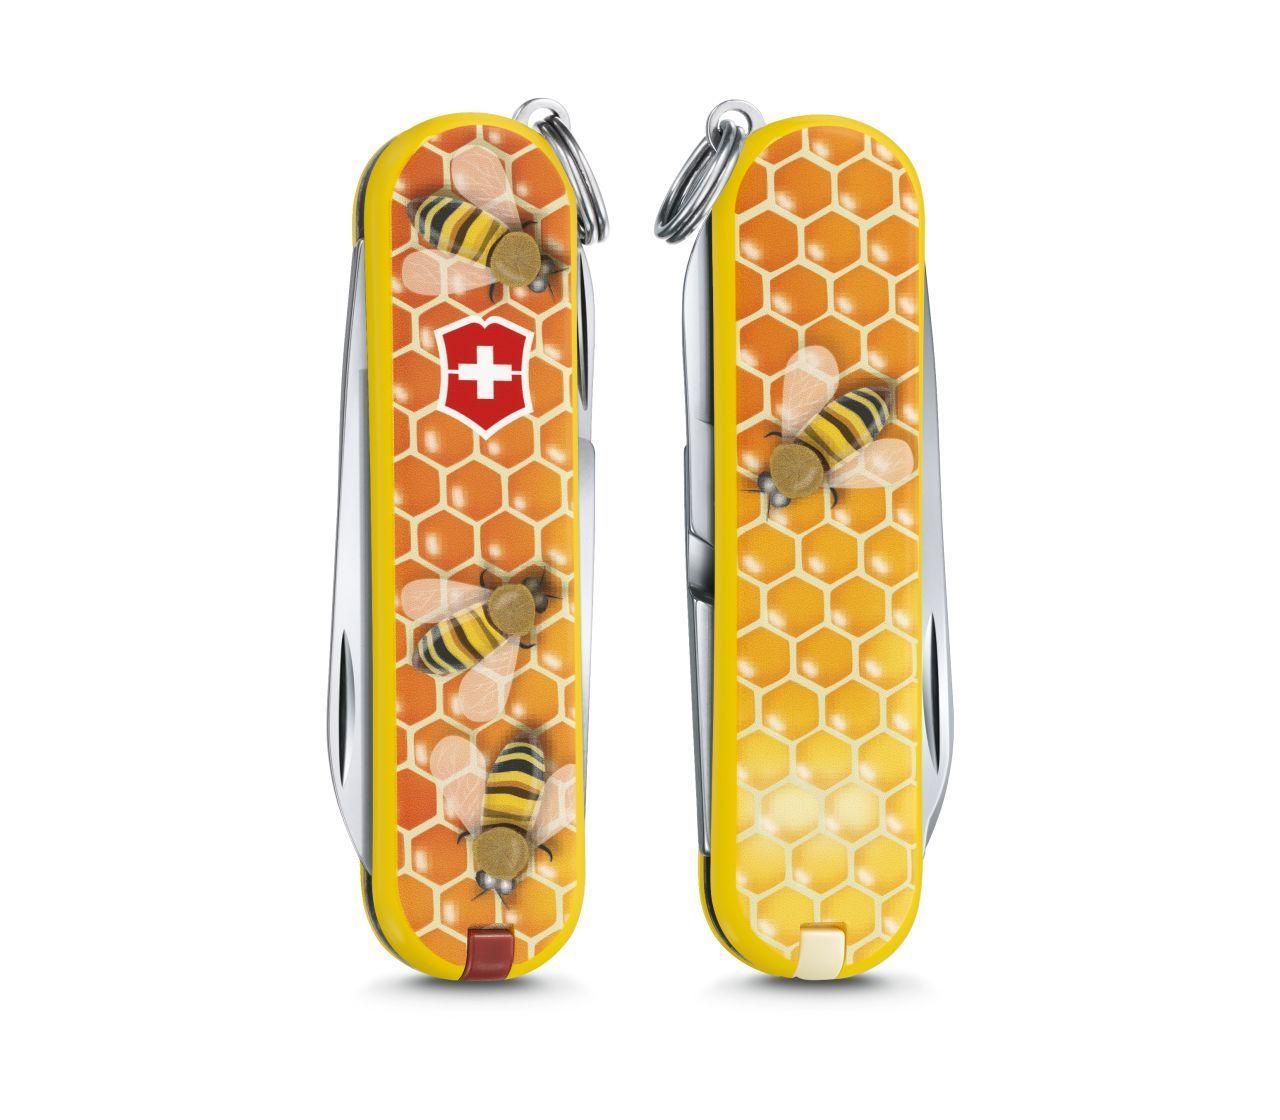 Складной нож Victorinox Classic limited edition 2017 Honey Bee (0.6223.L1702) 58мм 7функций пилочка для ногтей leslie store 10 4sides 10pcs lot